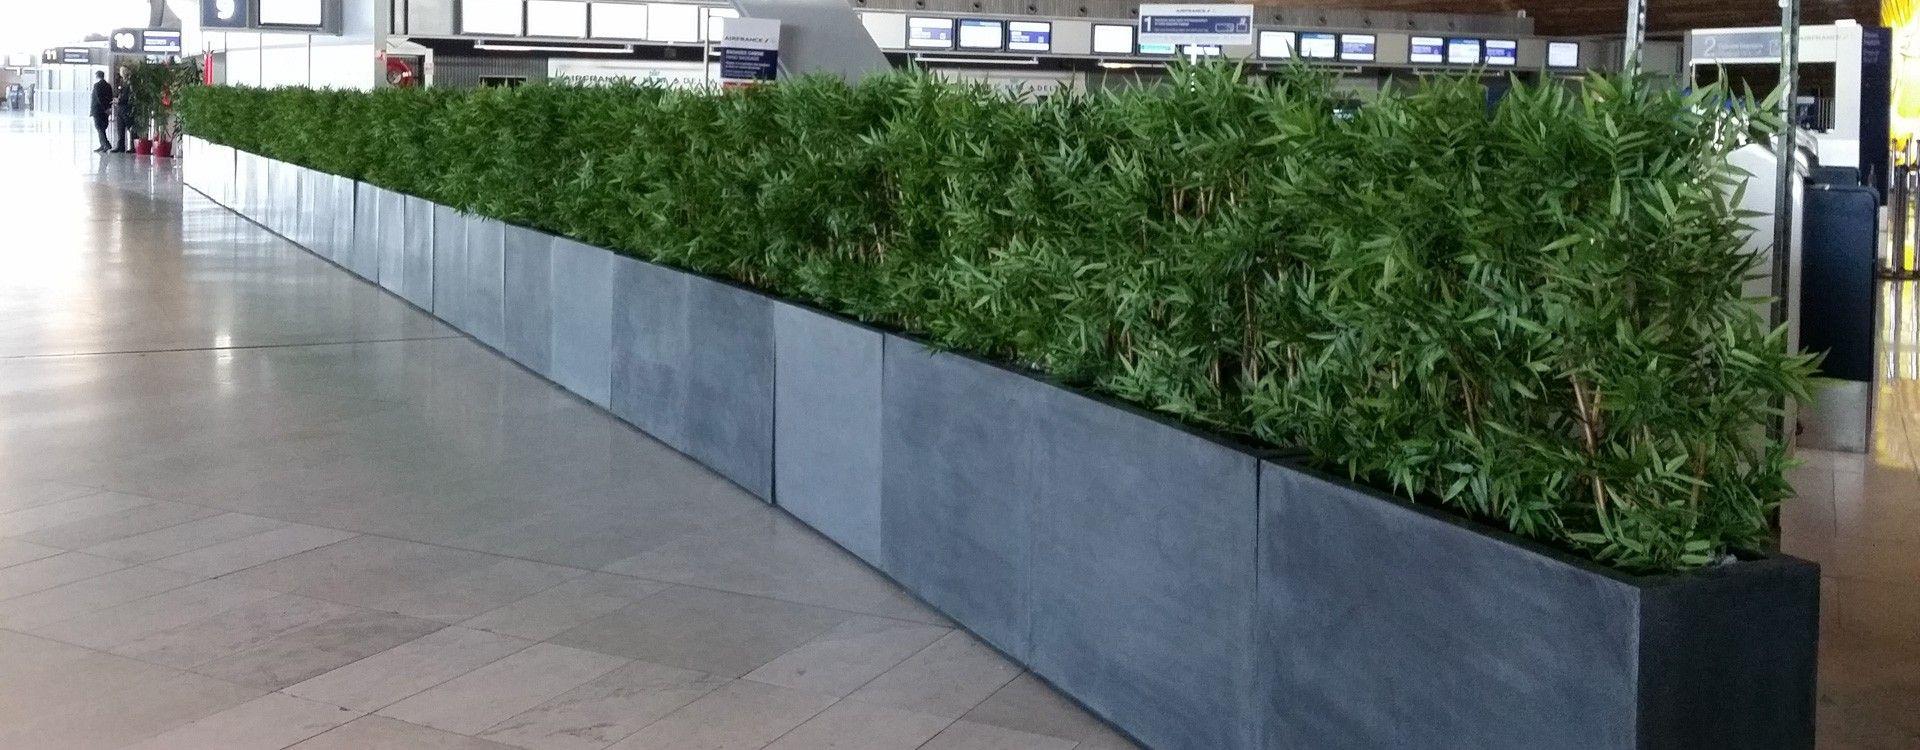 Vert Espace - bambous artificiels